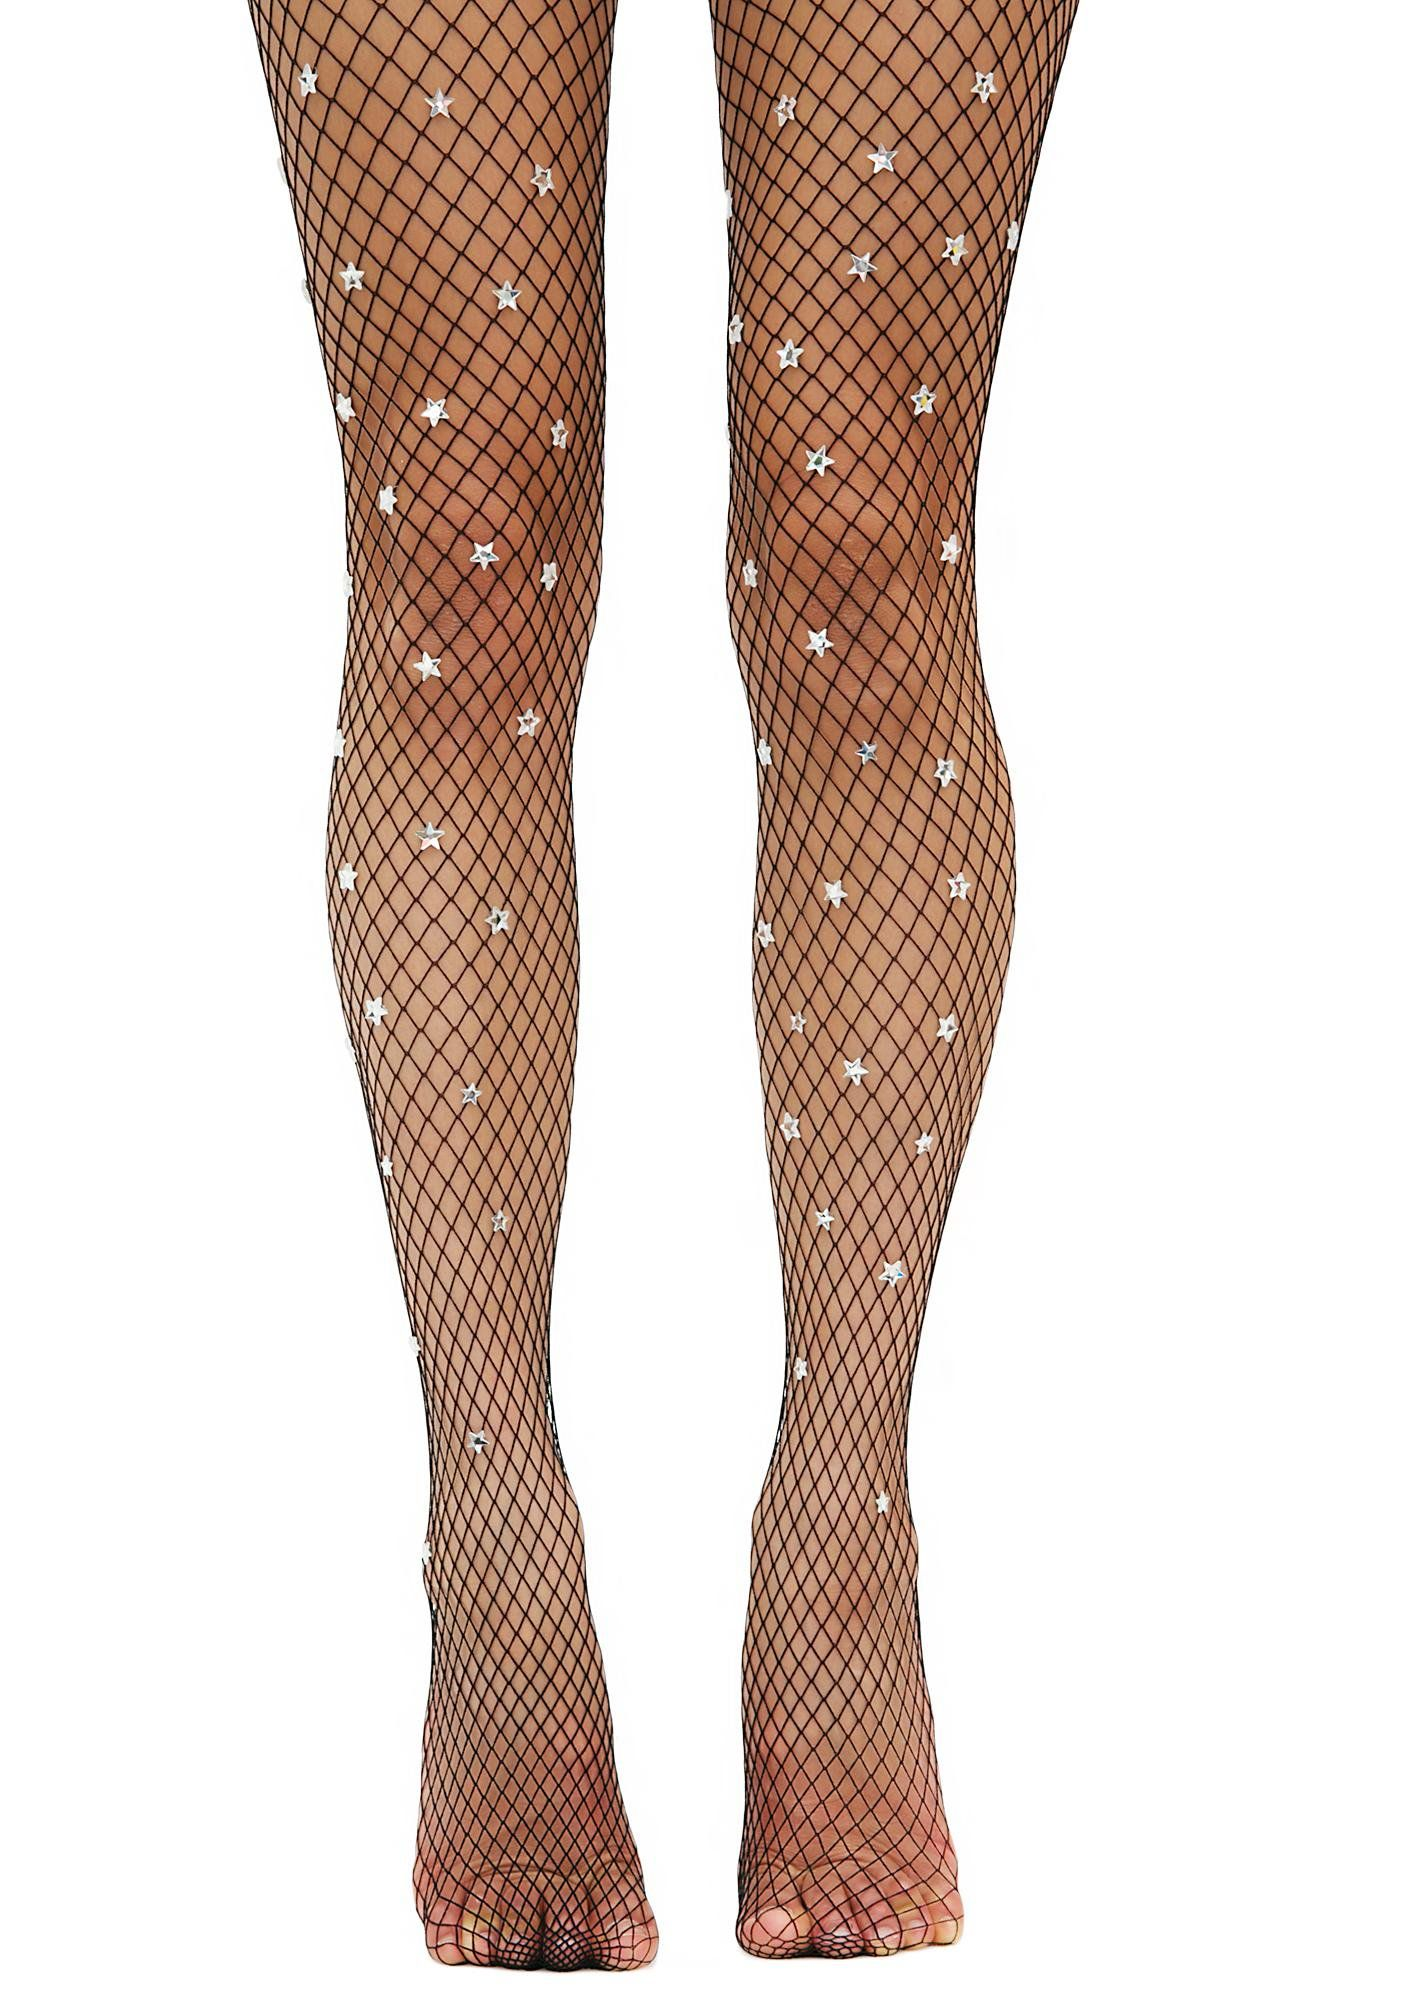 Embroidery Flower Women Mesh Fishnet Pattern Pantyhose Tights Stocking Sock C